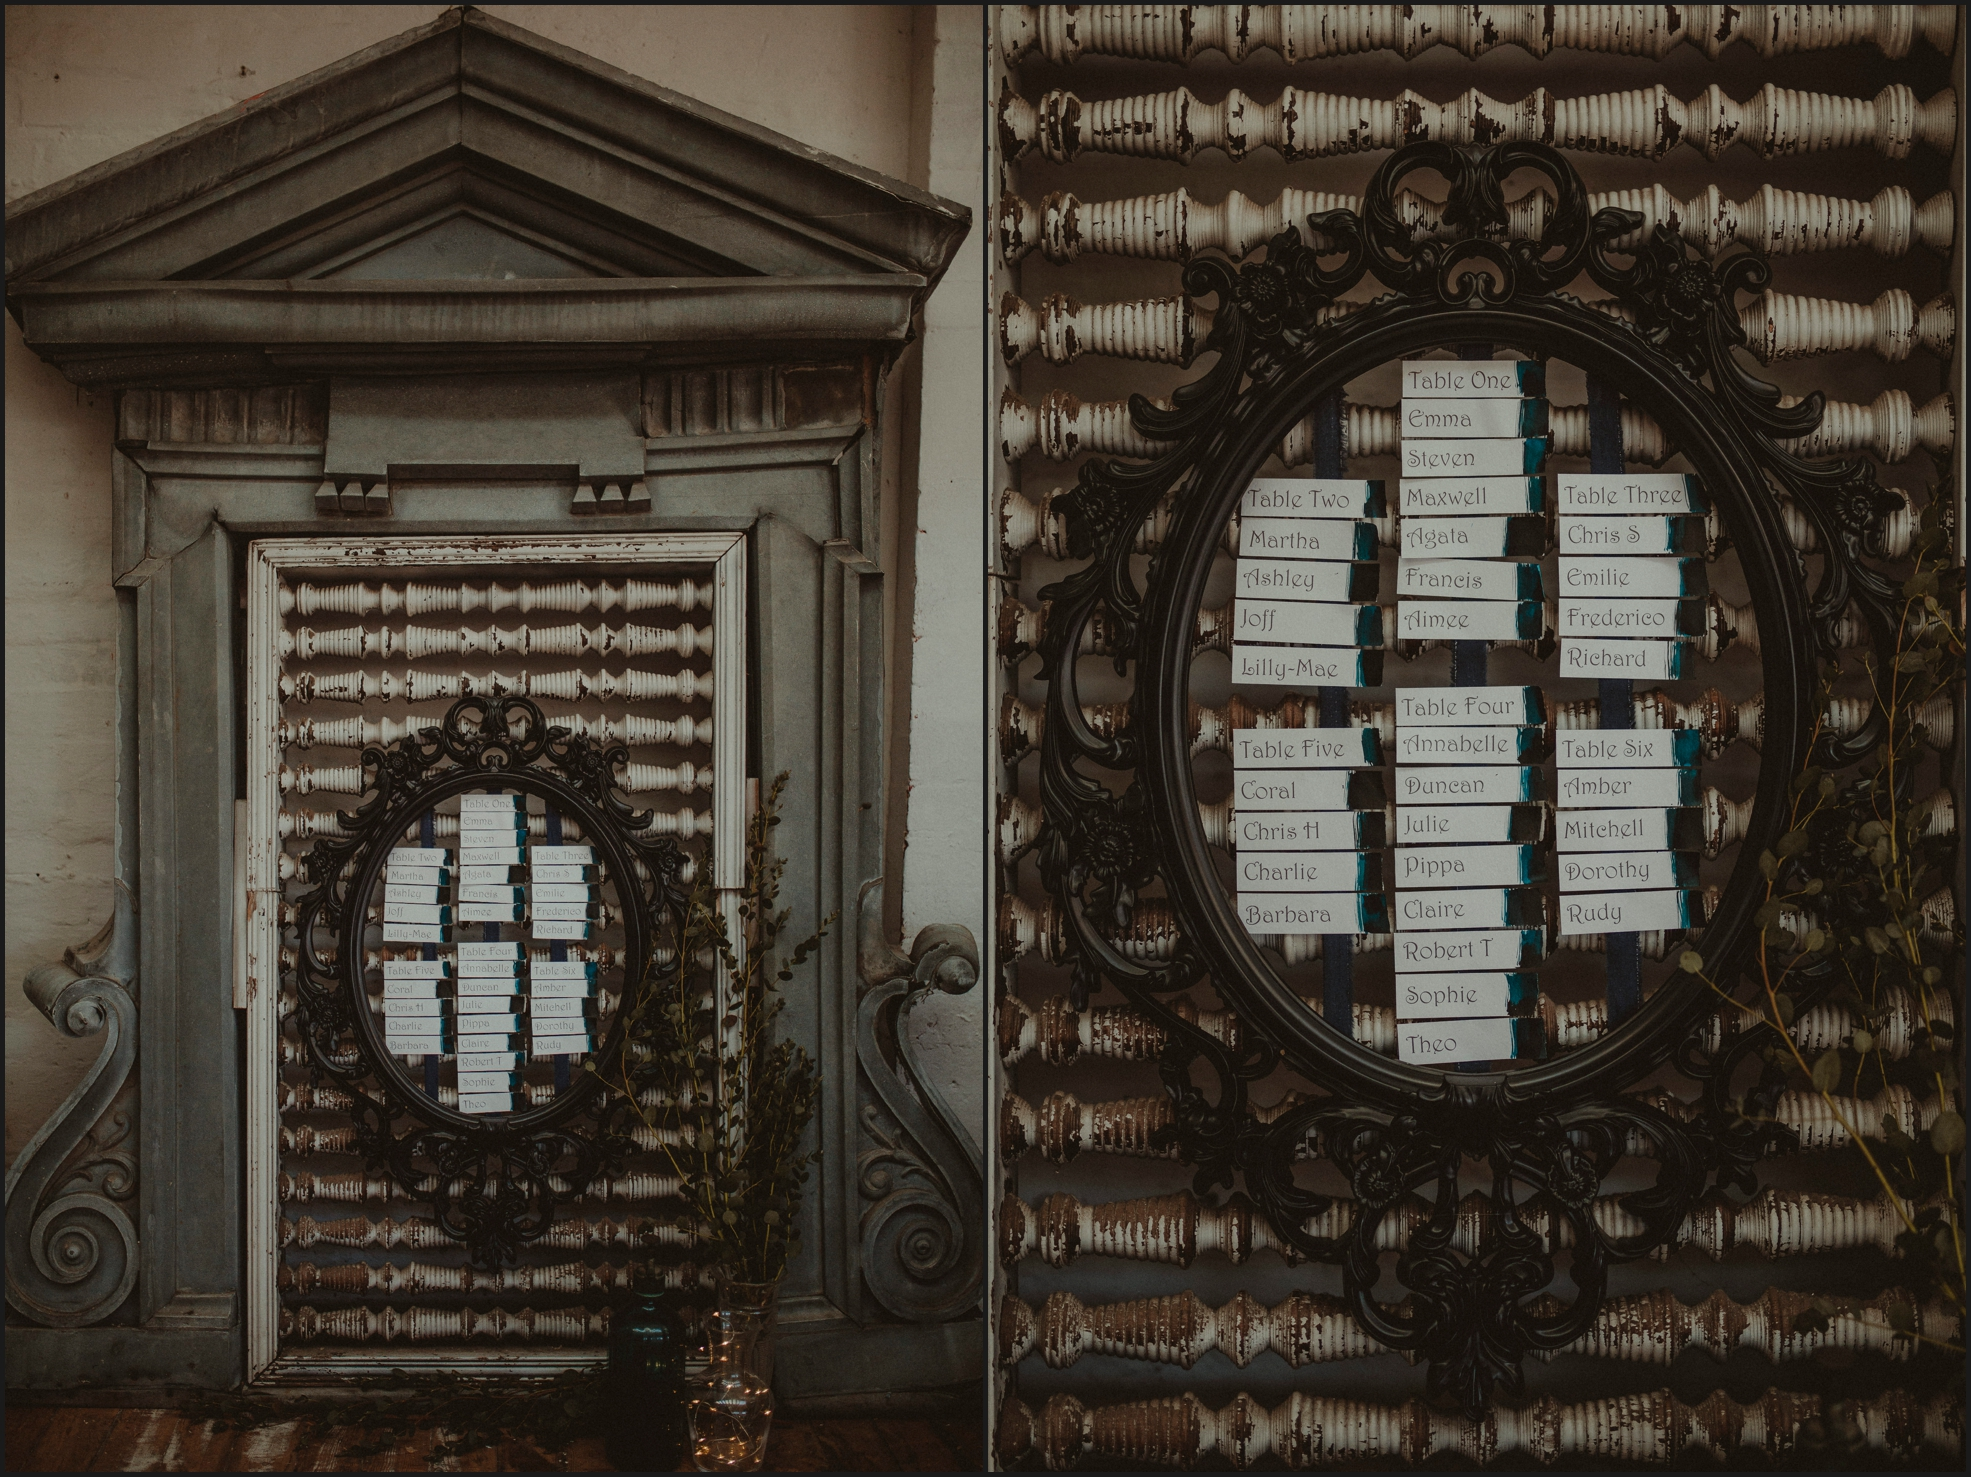 tableau, steampunk wedding, detail